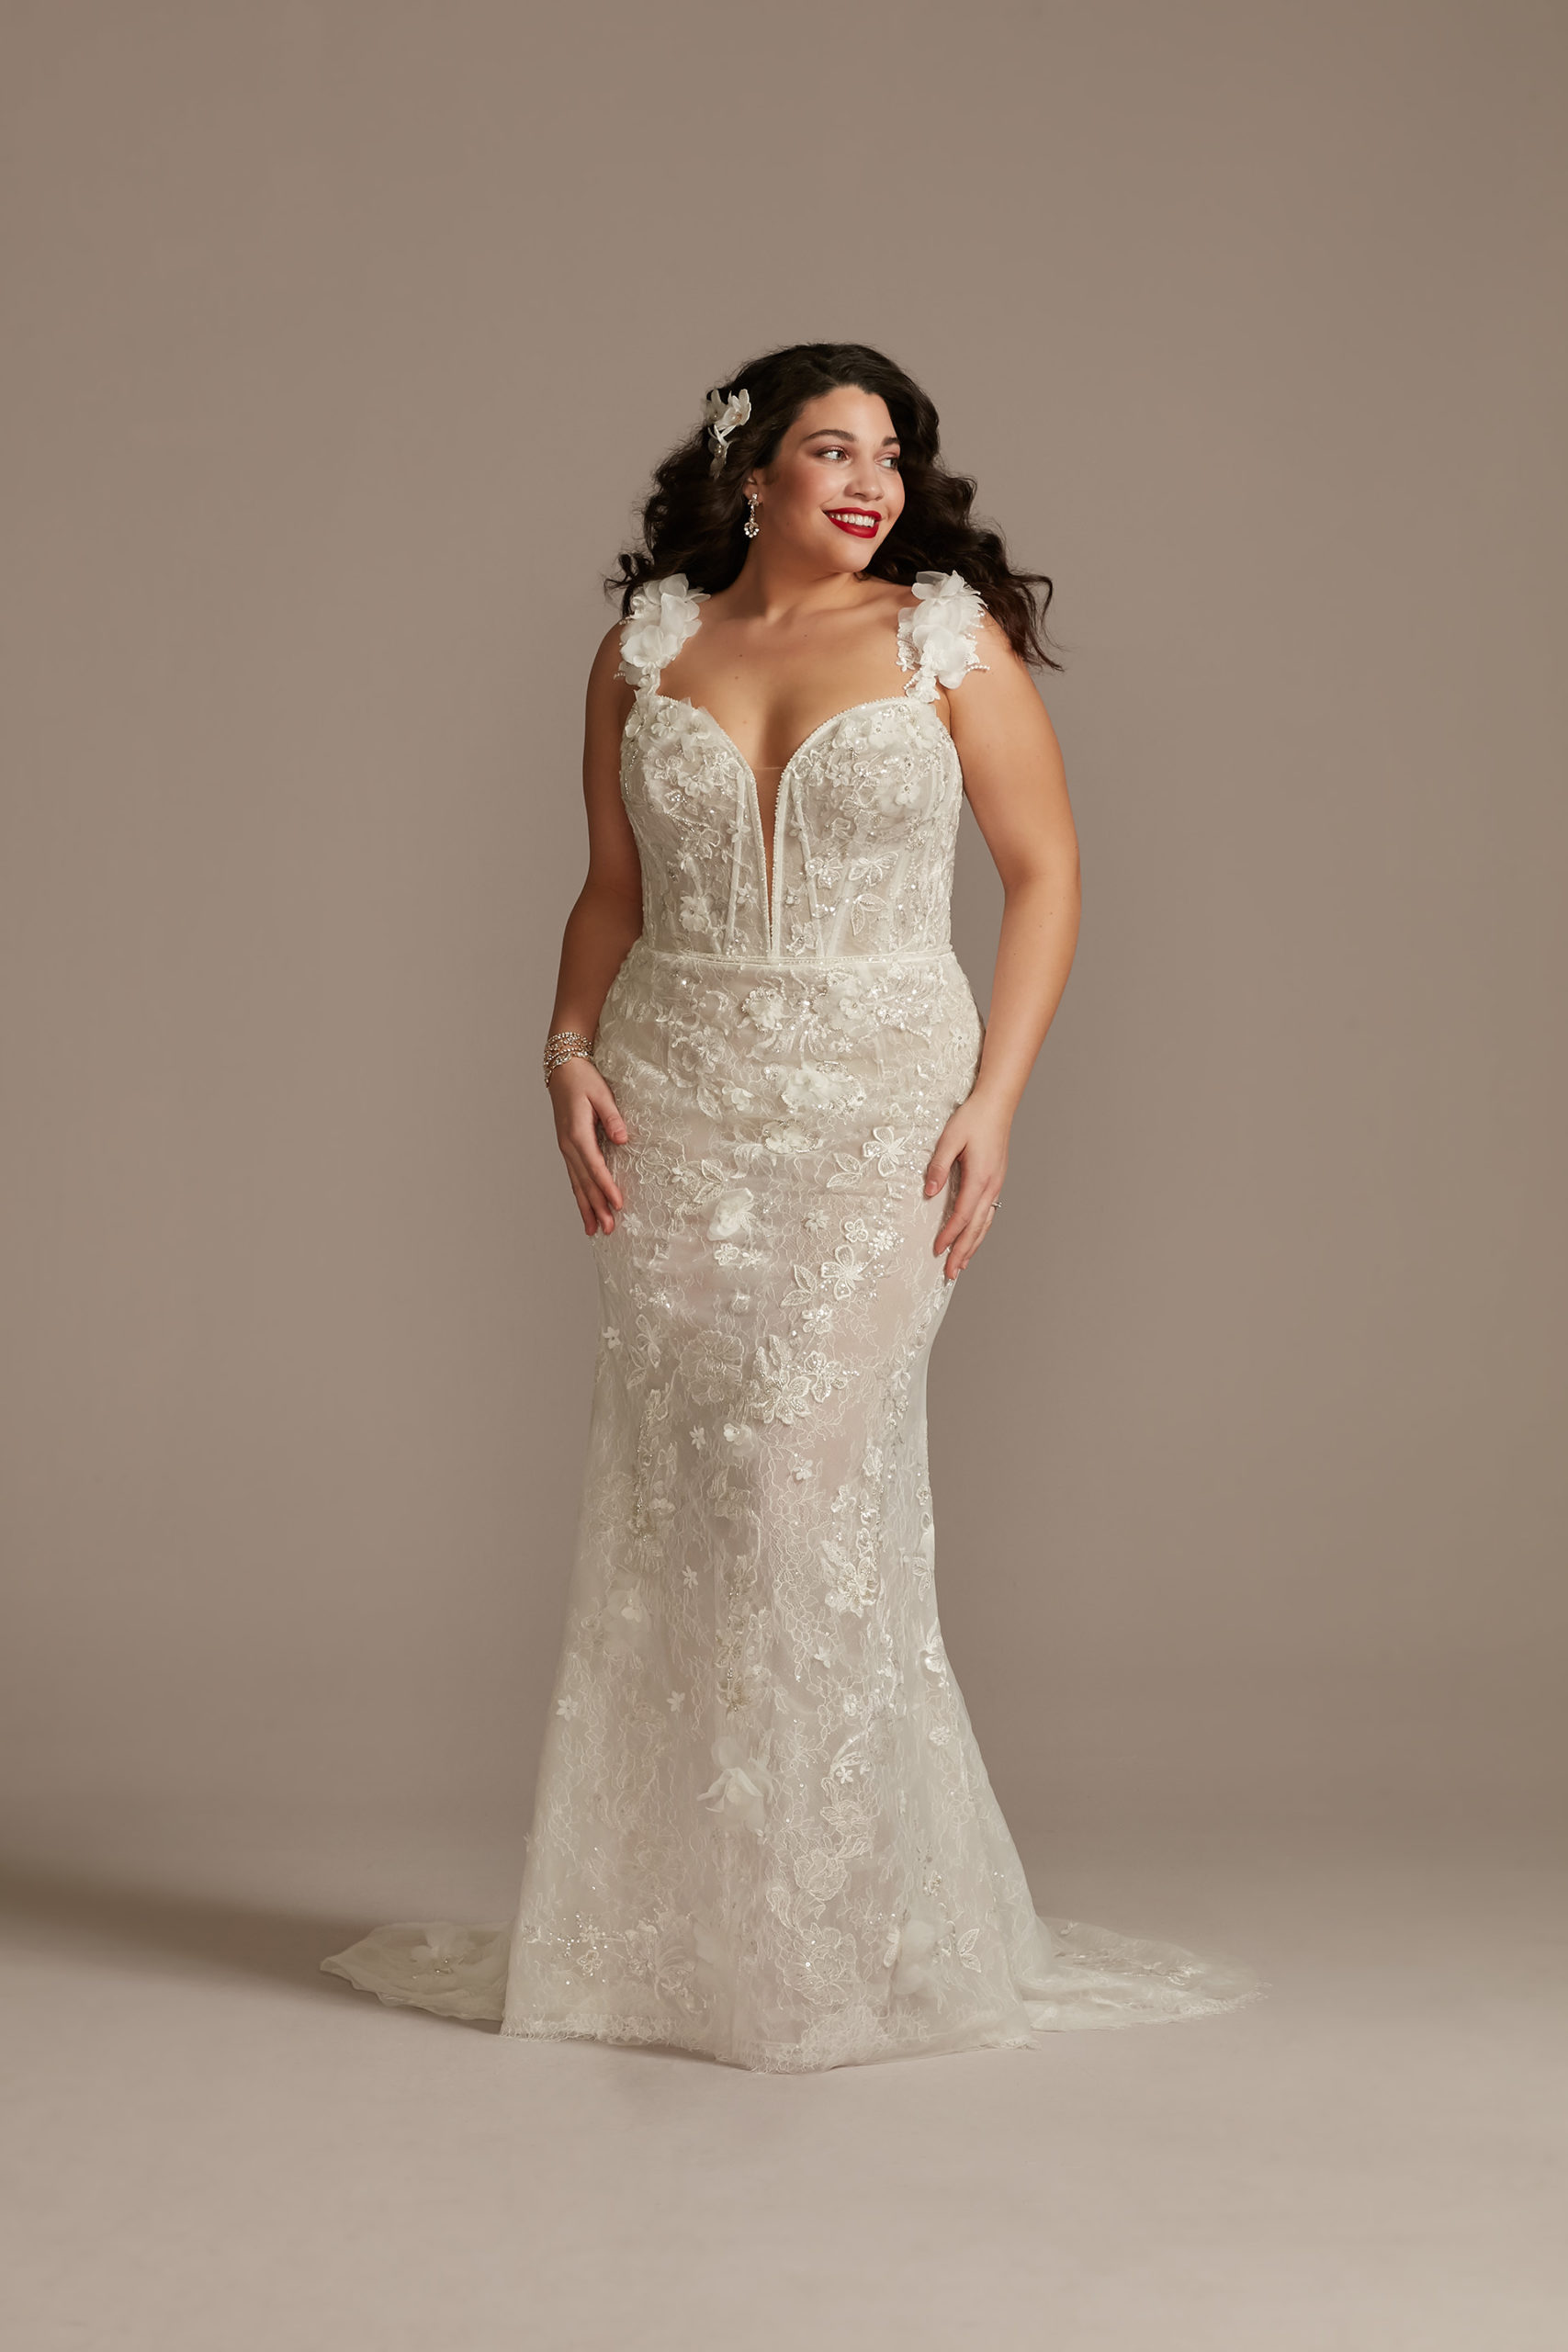 bride wearing 3D Floral Applique Plunge Bodysuit Wedding Dress